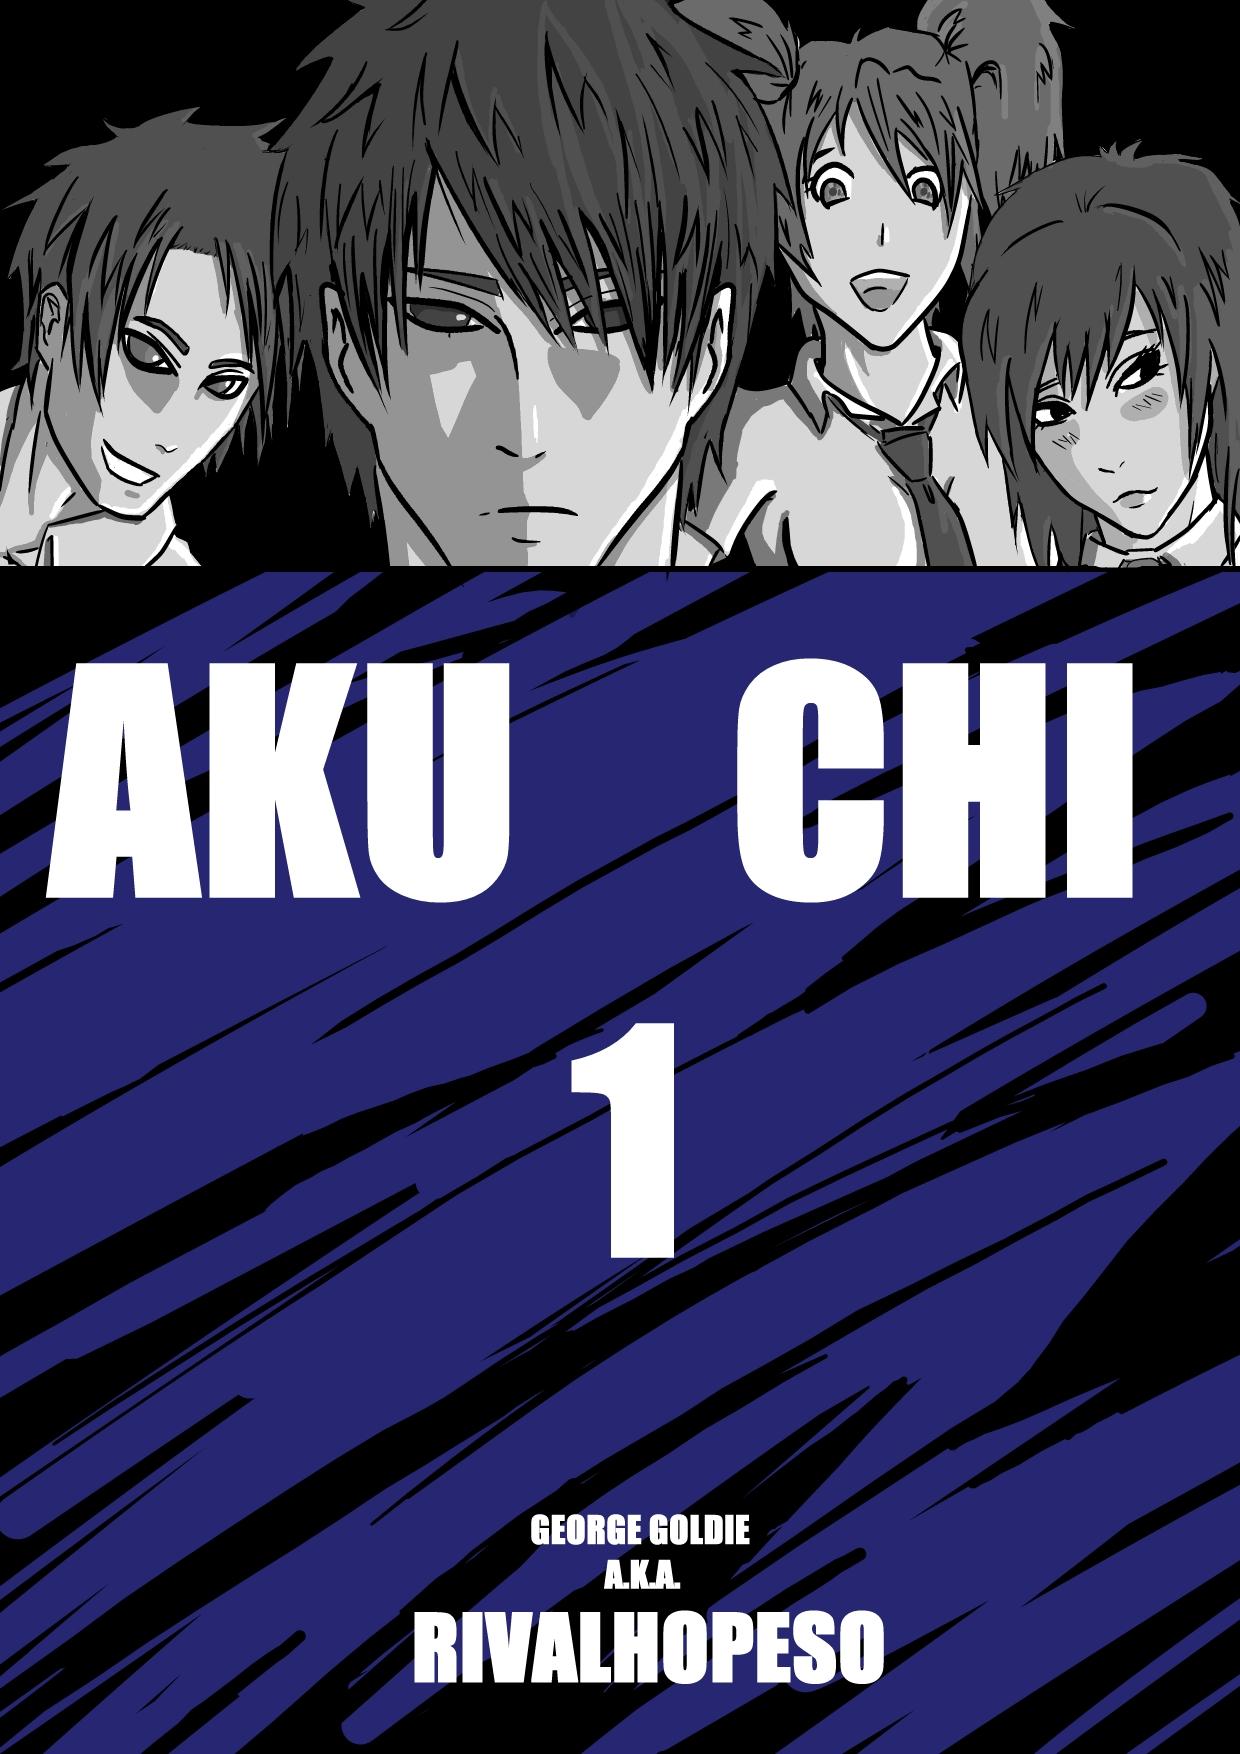 Aku Chi Cover Page: Ch 1 Pilot by Rivalhopeso